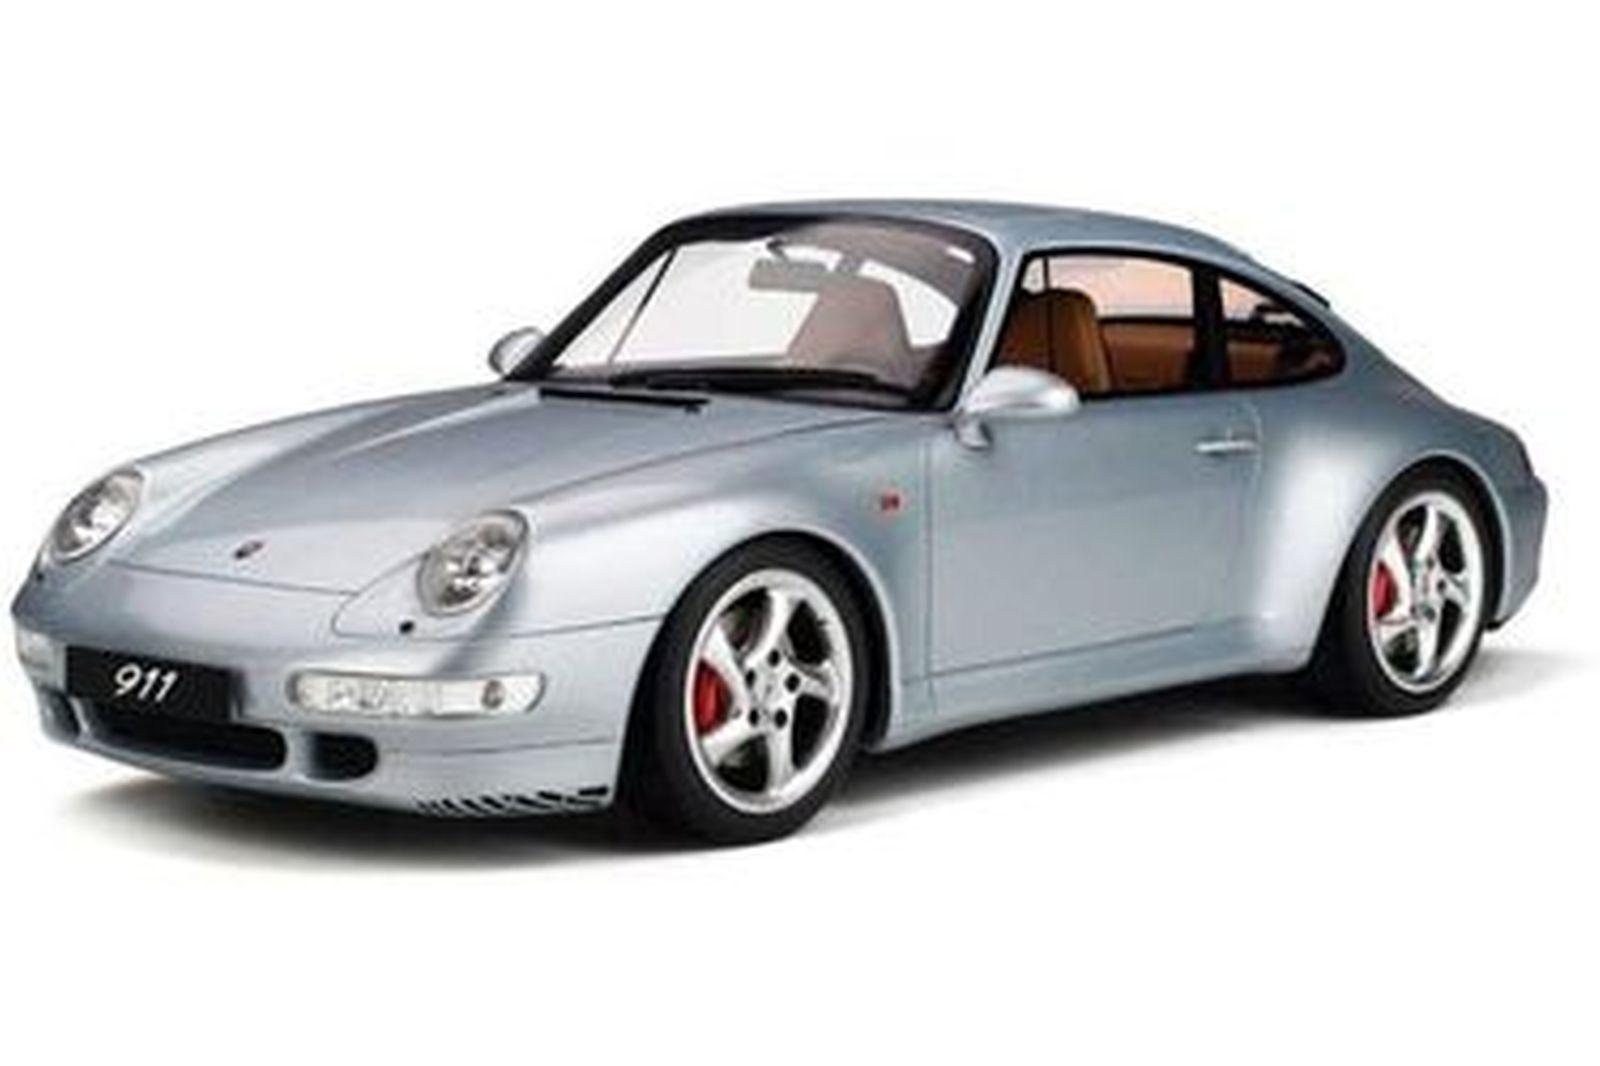 PORSCHE 911 99S CARRERA 4S